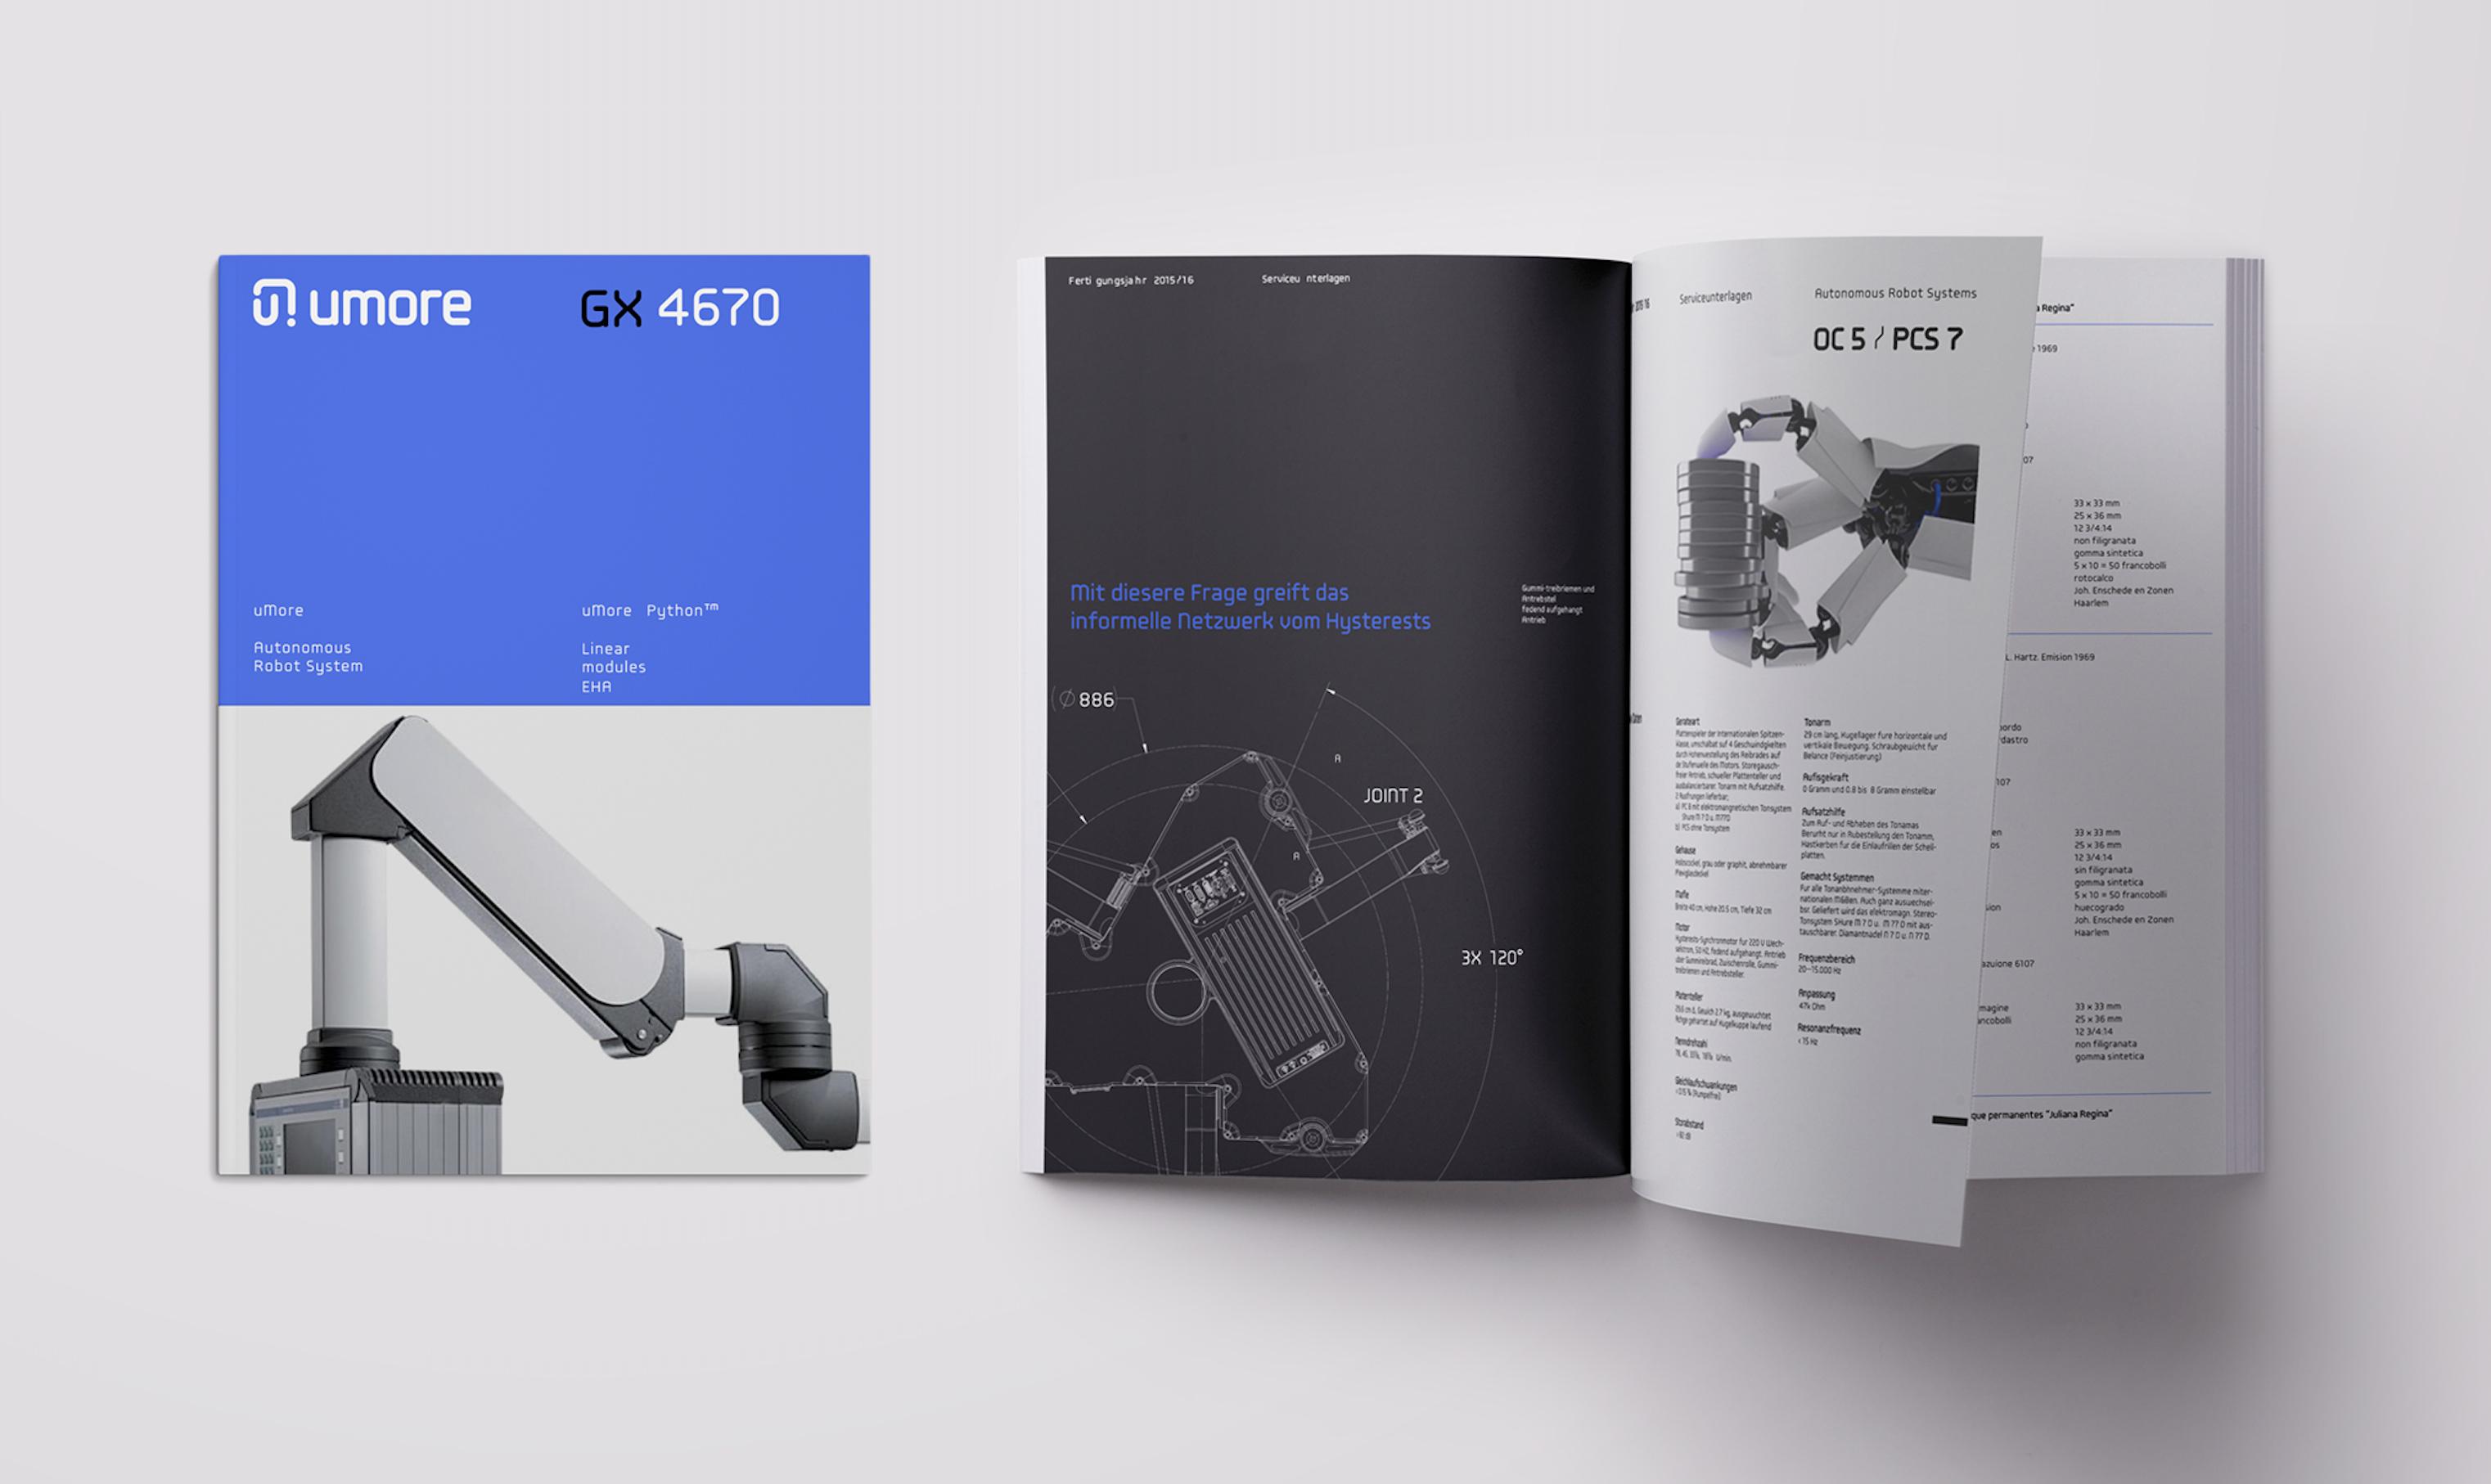 Umore Robotics Brochure By Buro Orangensaft 493271 Freelancer On Guru